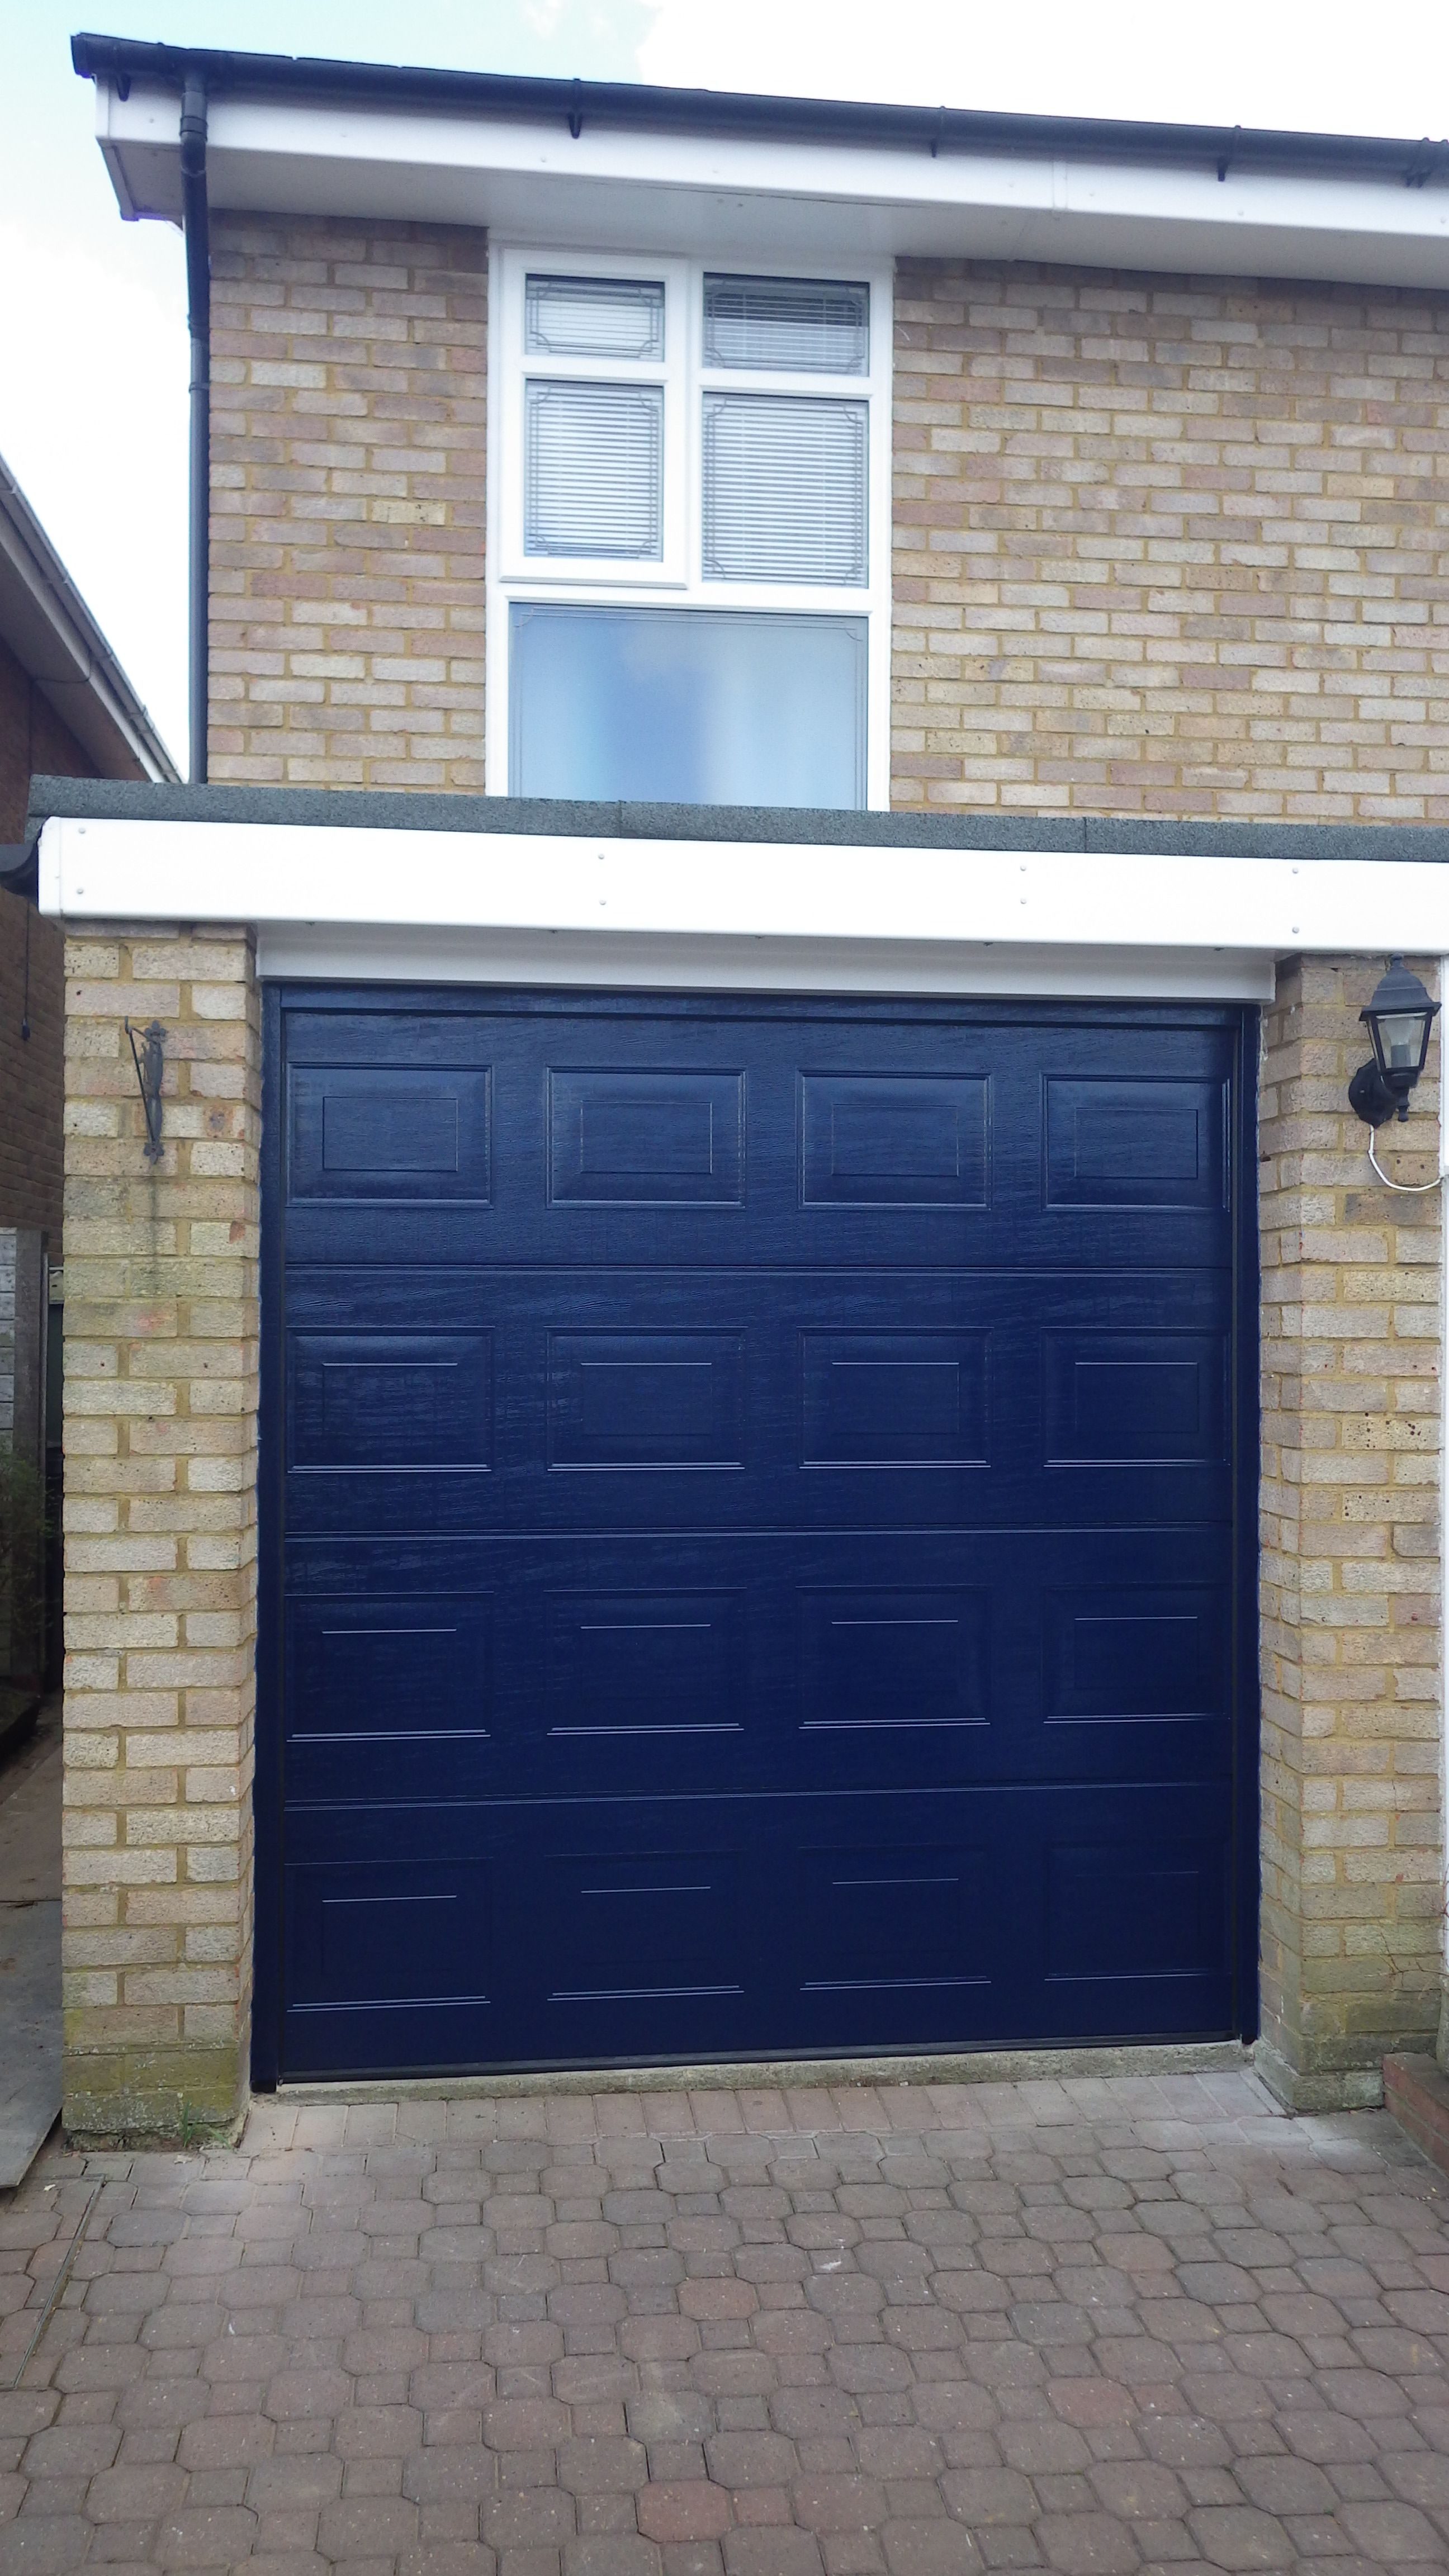 Hormann Sectional S Panelled Woodgrain Garage Door In Dark Blue Puertas Azules Puertas Ventanas